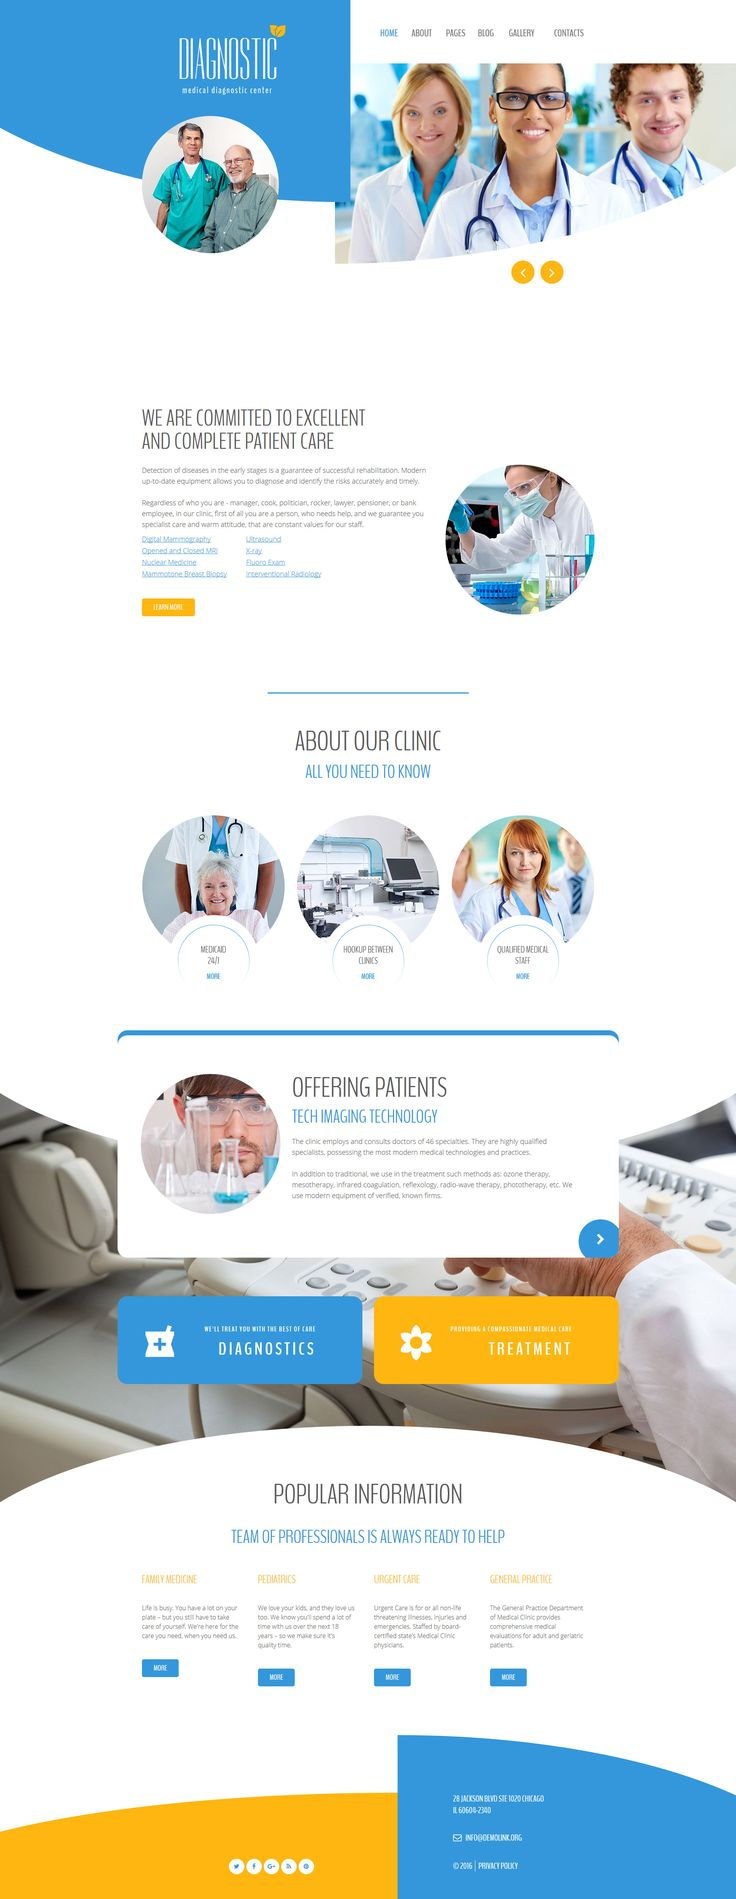 45 best joomla joomla template free images on pinterest medical responsive joomla template httptemplatemonsterjoomla pronofoot35fo Choice Image